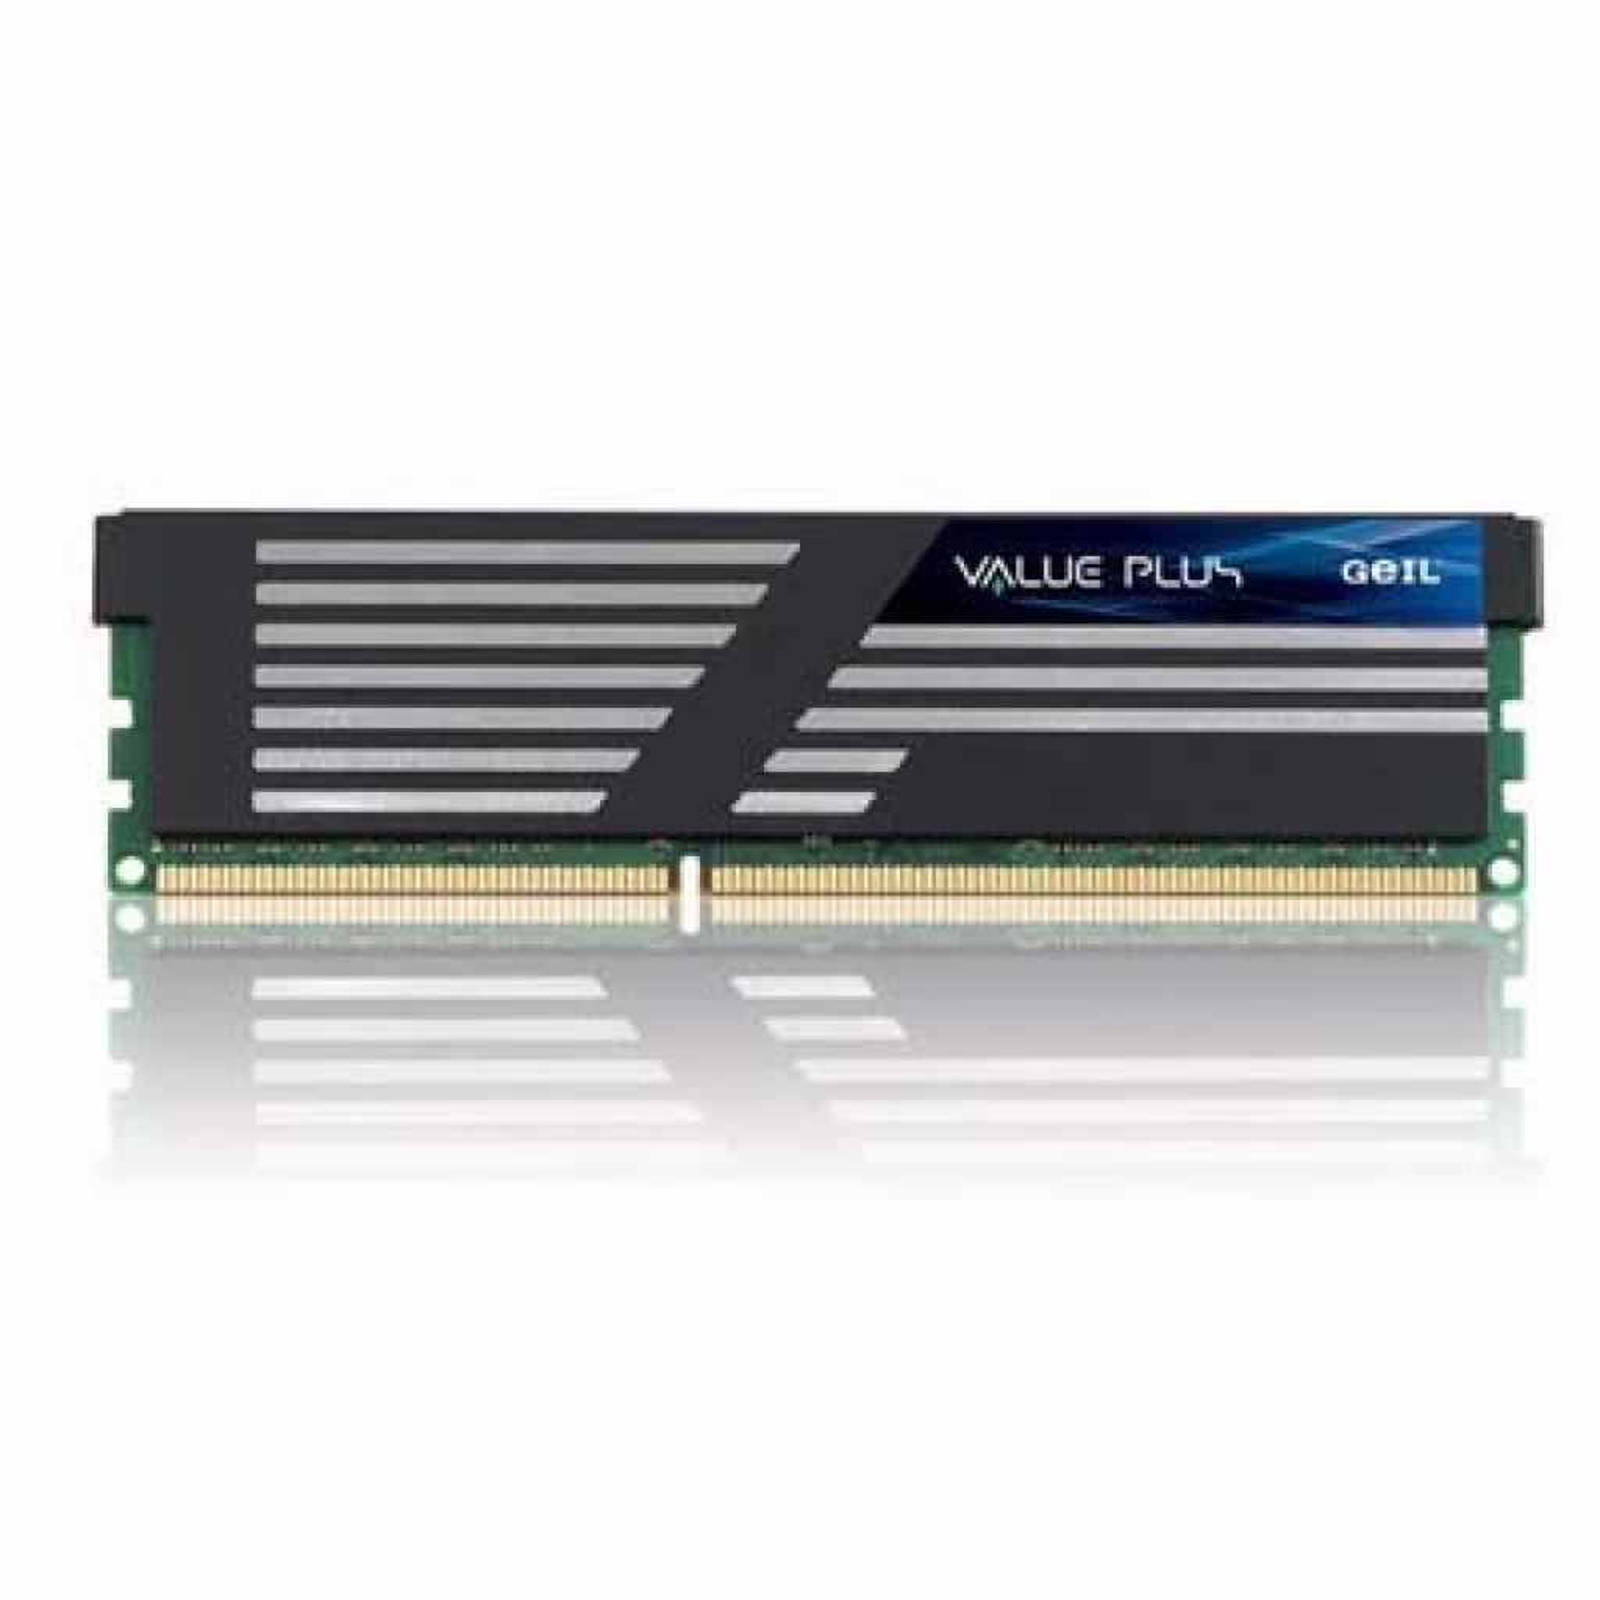 Модуль памяти для компьютера DDR3 4GB (2x2GB) 1333 MHz GEIL (GVP34GB1333C7DC)